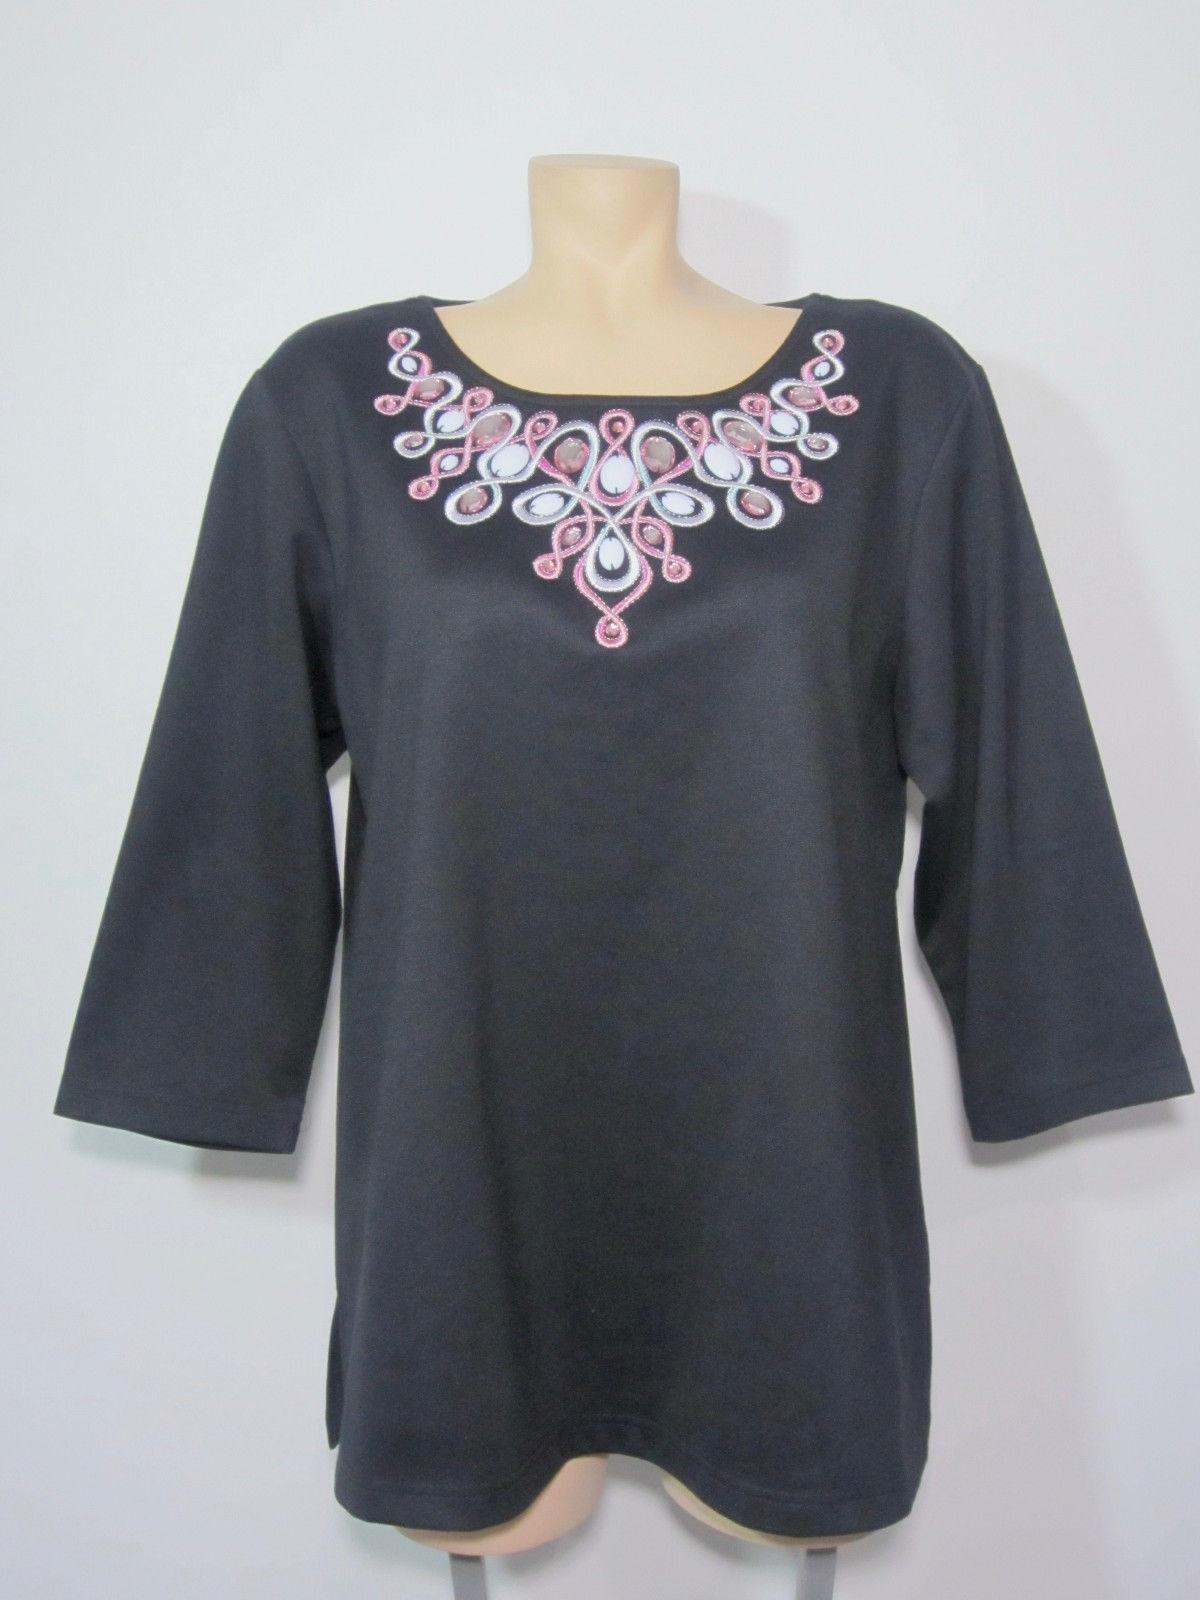 592b652ef7b5c0 ... Bob Mackie Wearable Art Women s Shirt Large Black Rhinestones  Embroidered ...